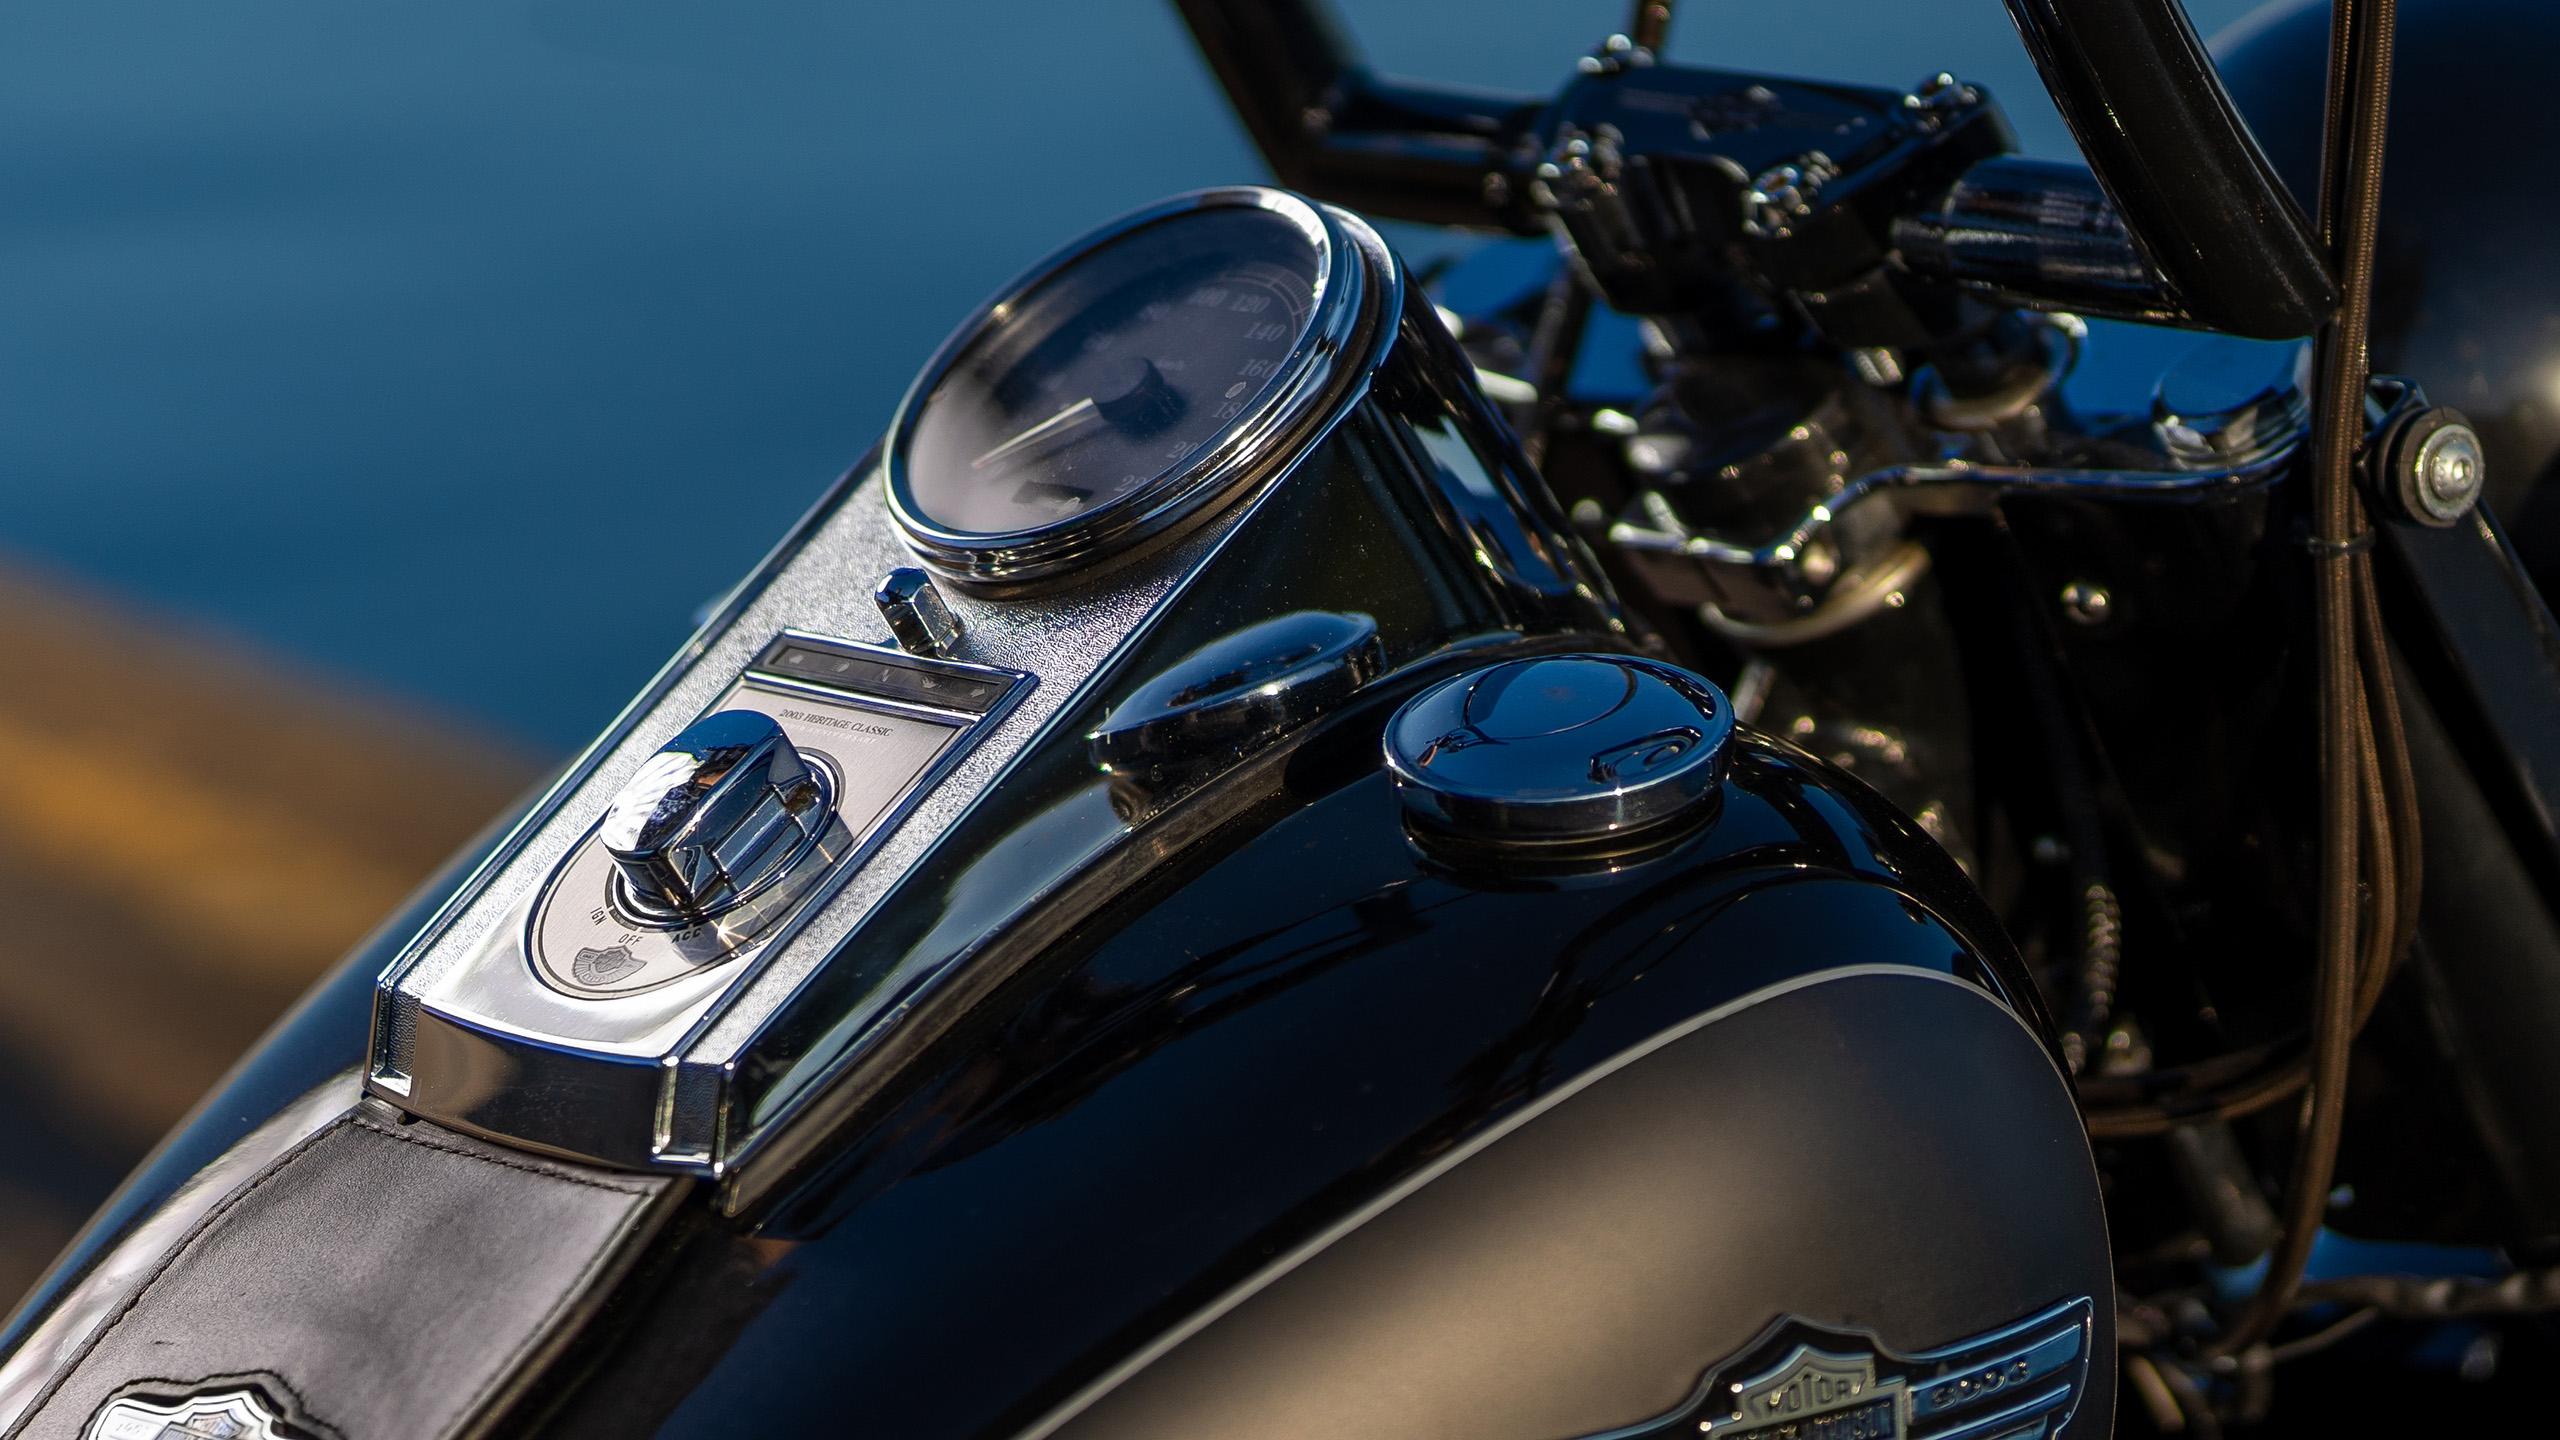 Harley Davidson Heritage Softail 4